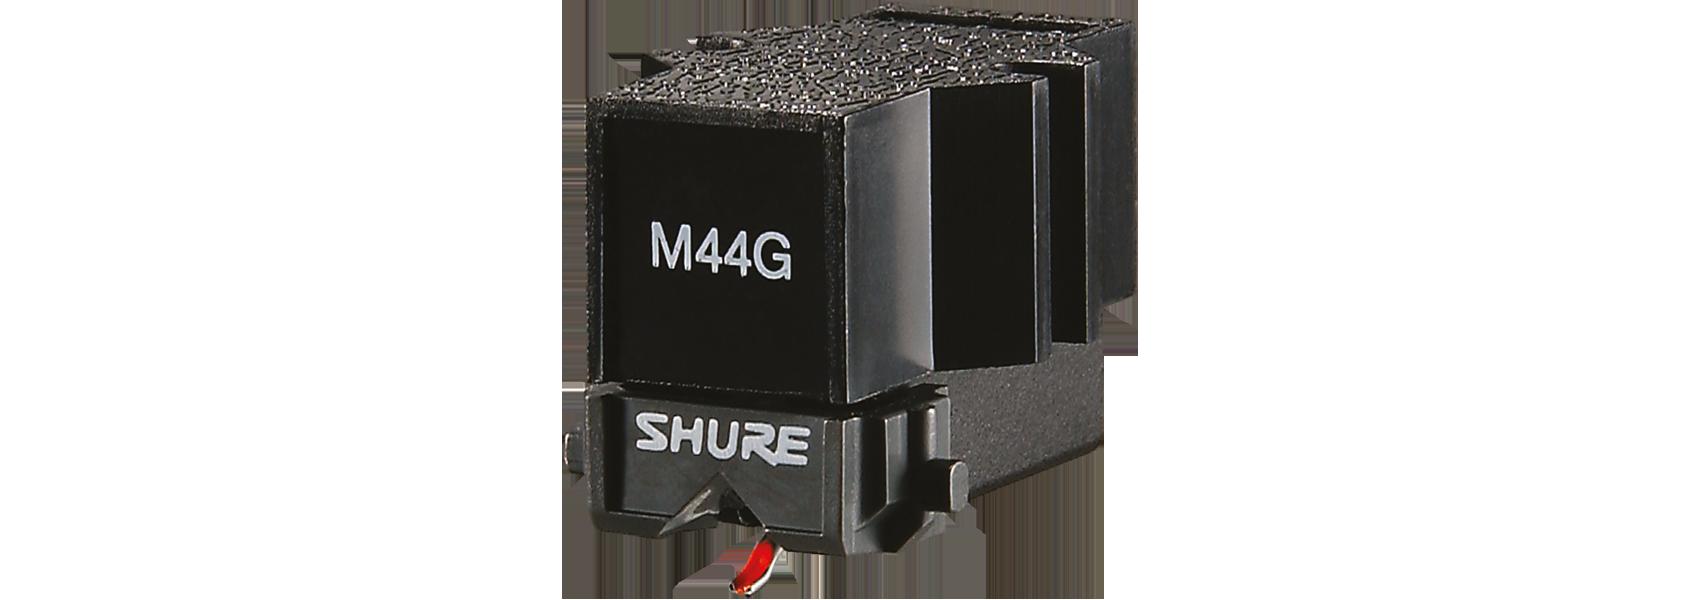 Immagine Shure M44G Testina Fonografica per DJ